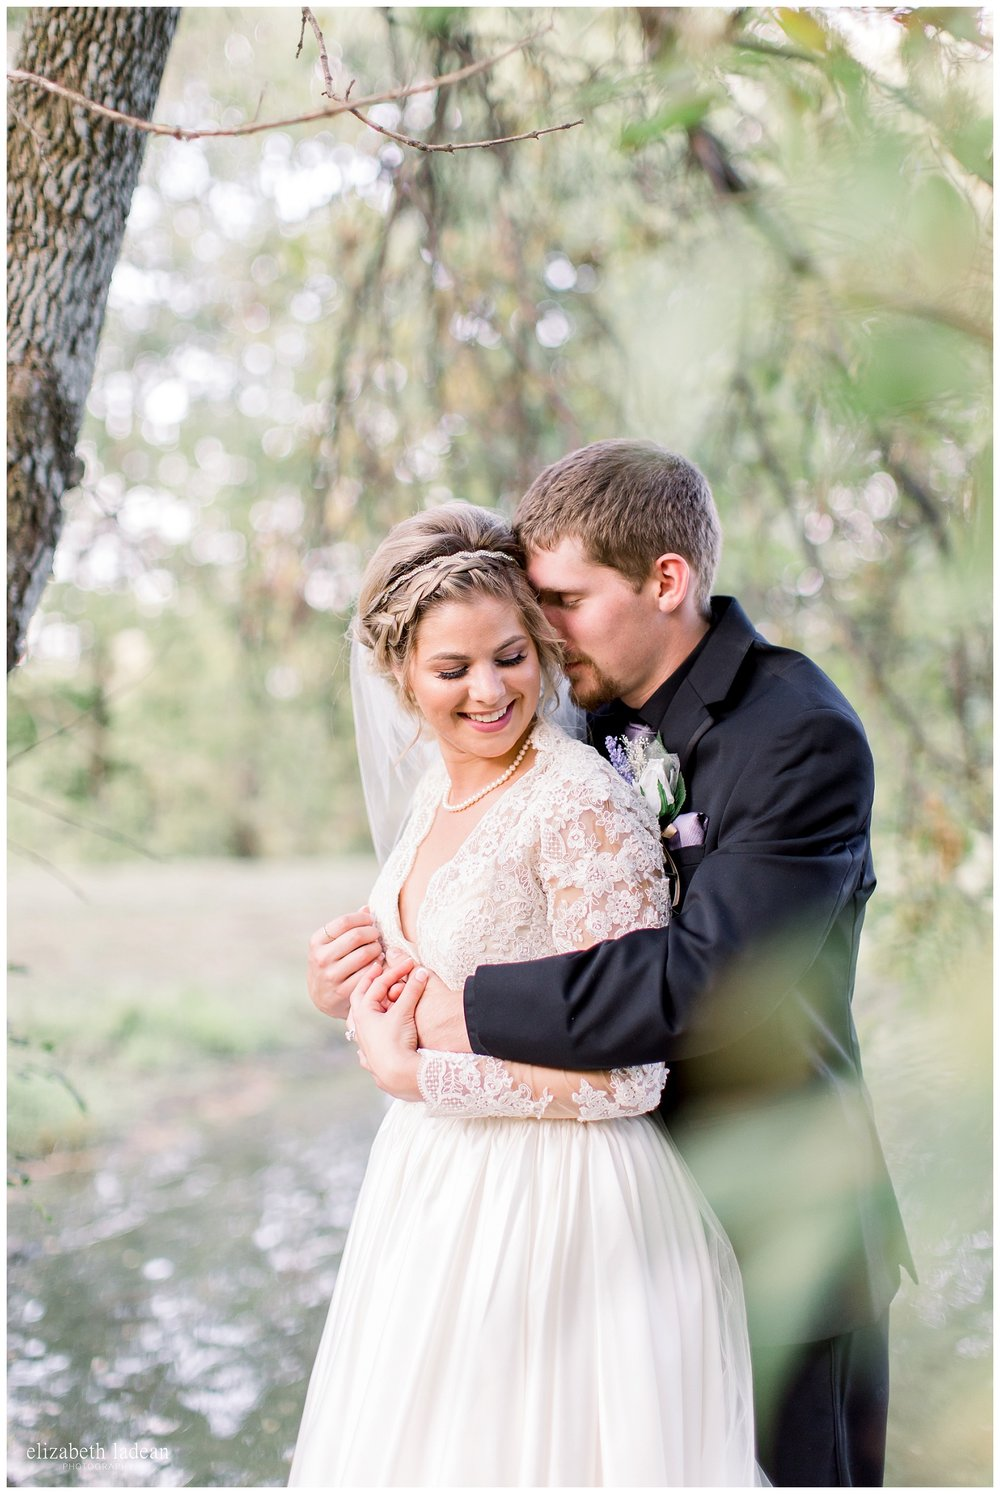 Natural-Light-Wedding-Photography-Kansas-City-S+B2018-elizabeth-ladean-photography-photo_1083.jpg